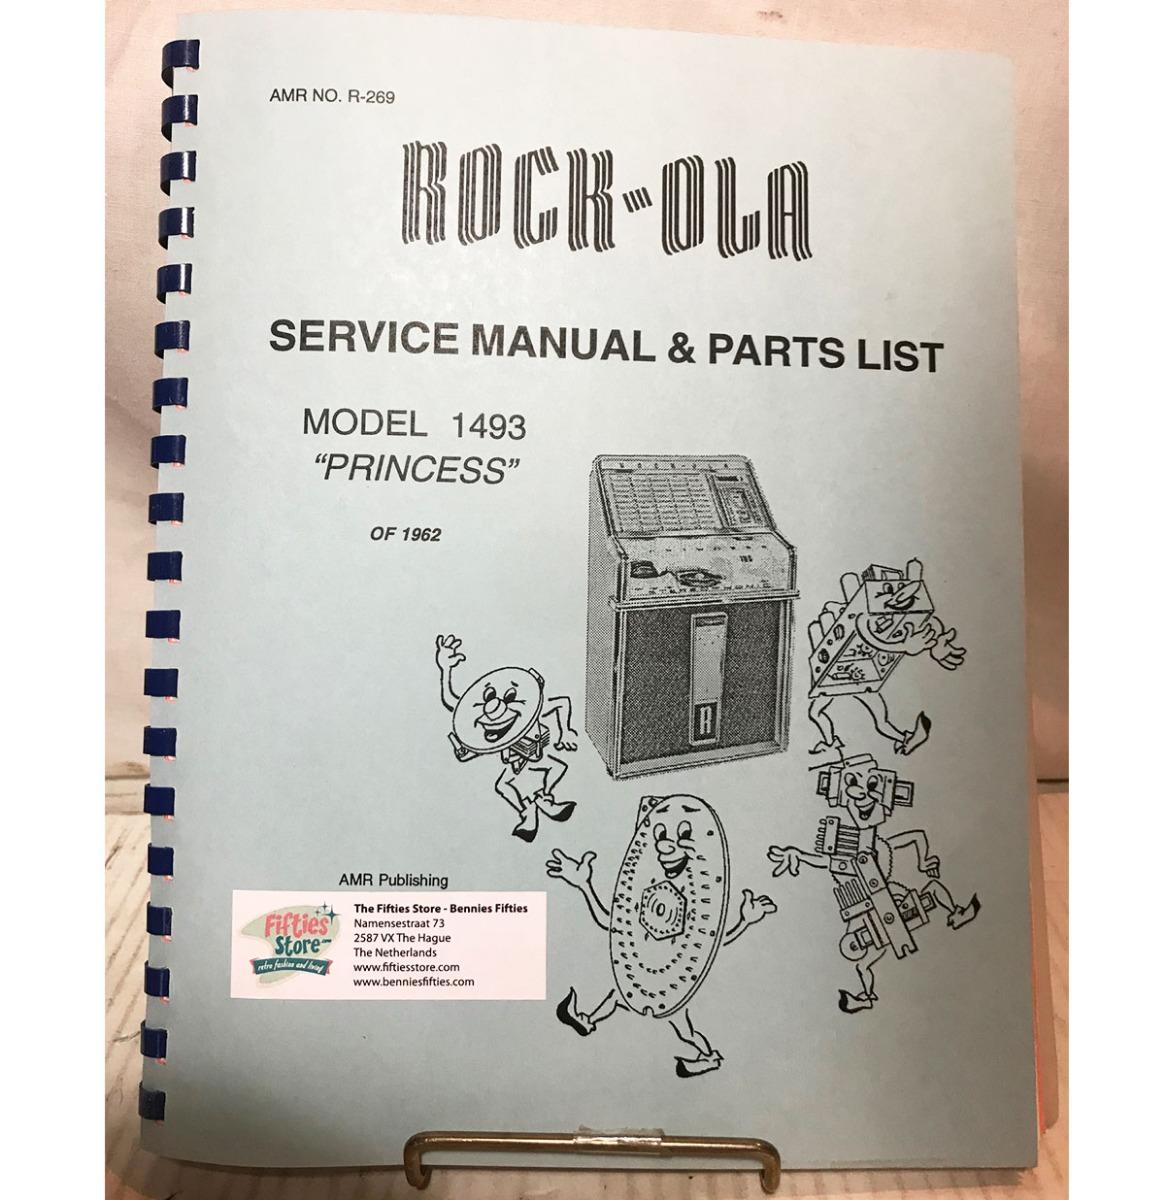 Service Manual - Rock-Ola Jukebox Model 1493 'Princess'